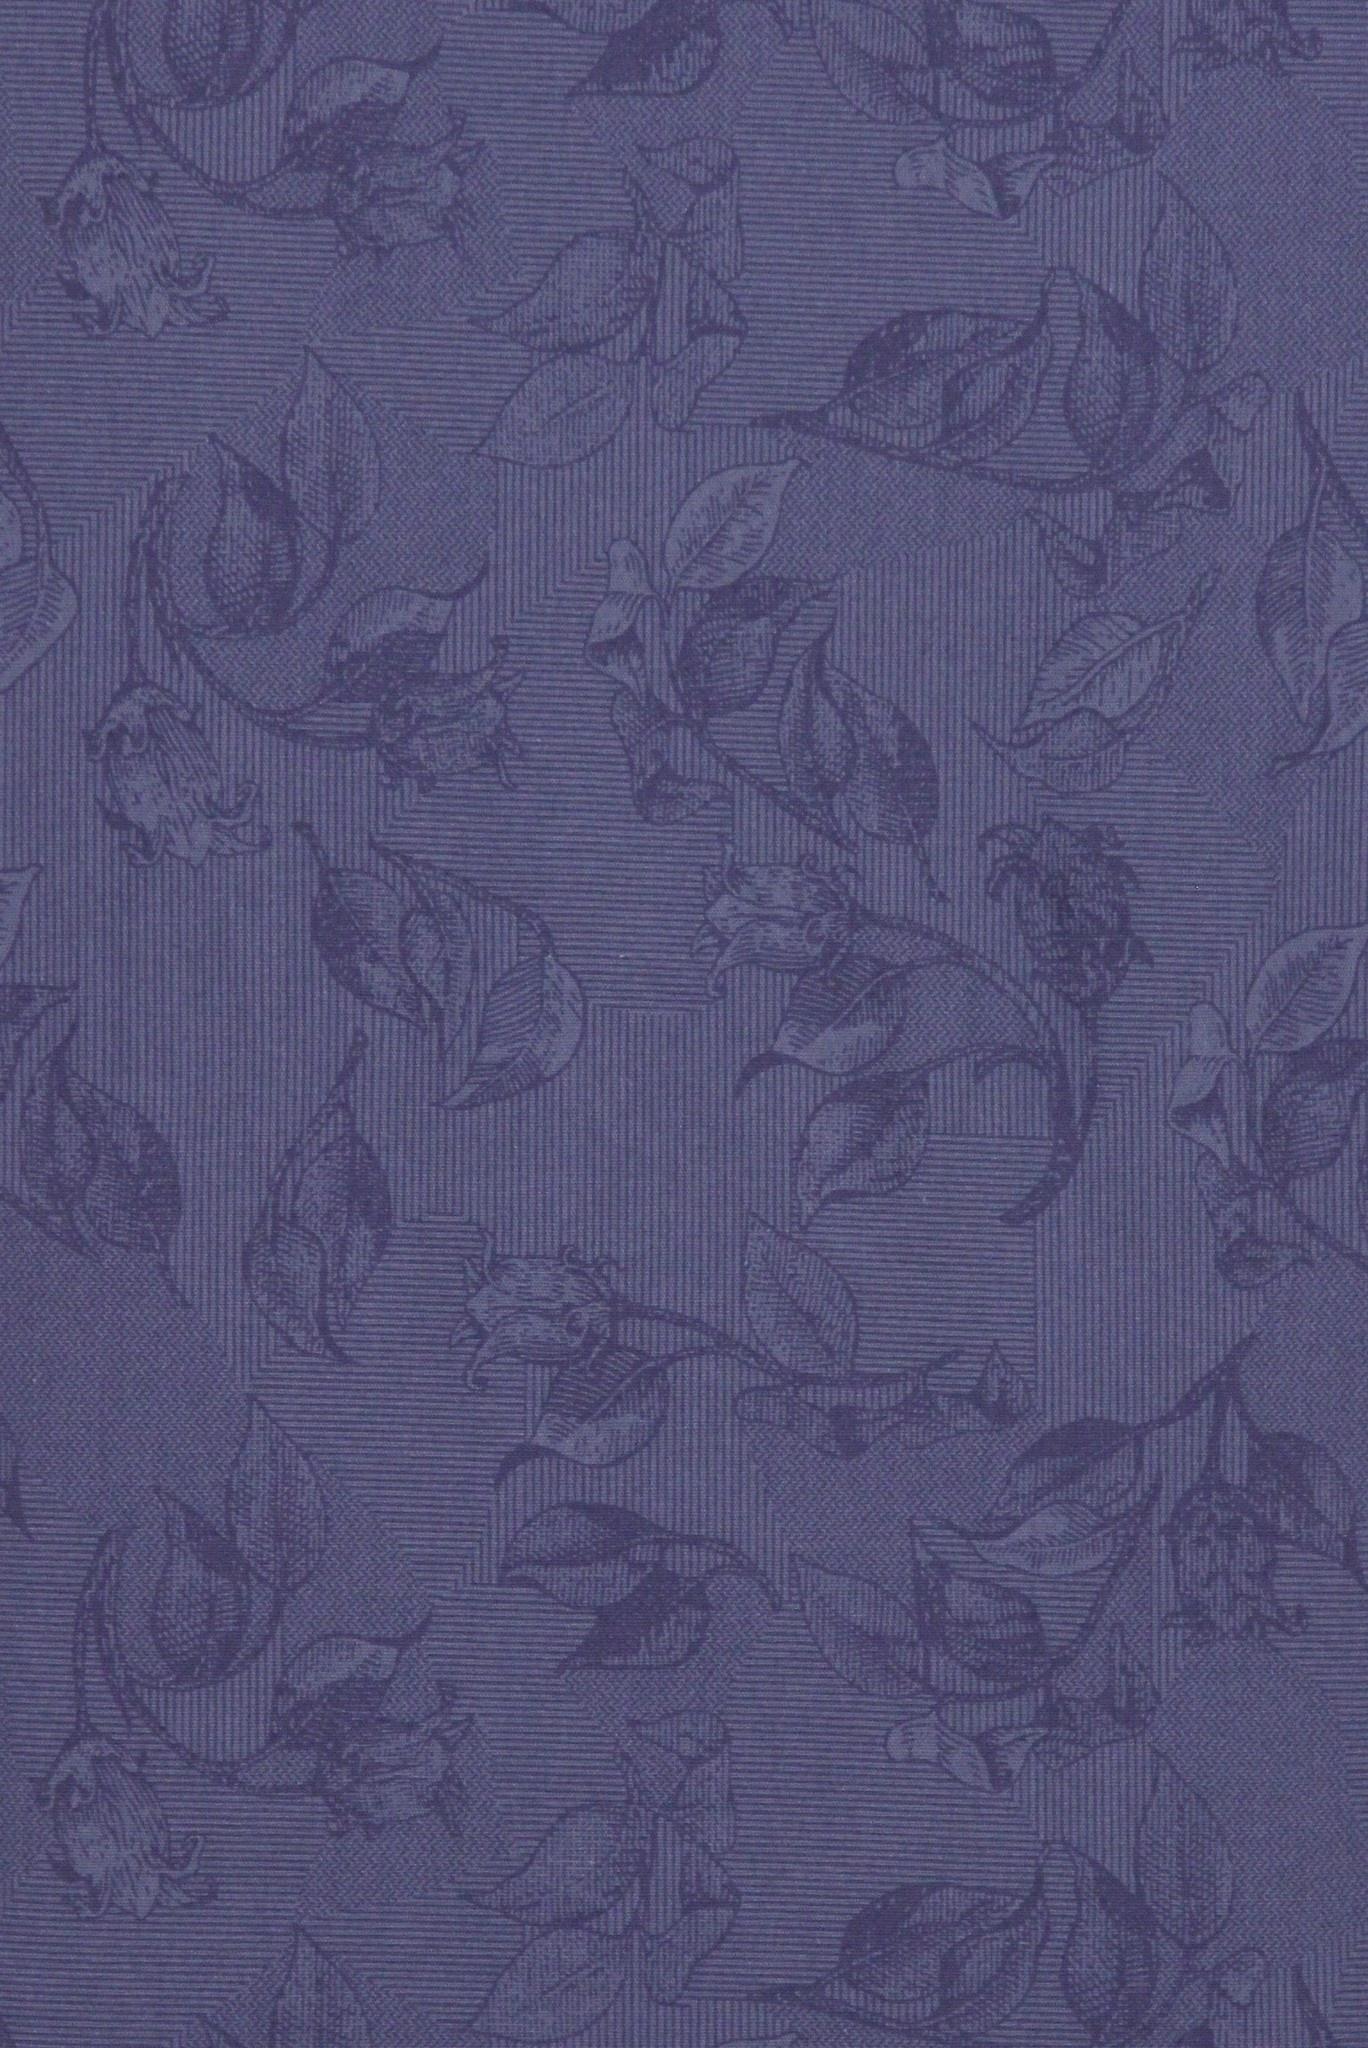 fc829b129d5c ... Gentile Bellini Camisas modernas para hombre - Moda de hombre italiana  - 3005 - Azul ...